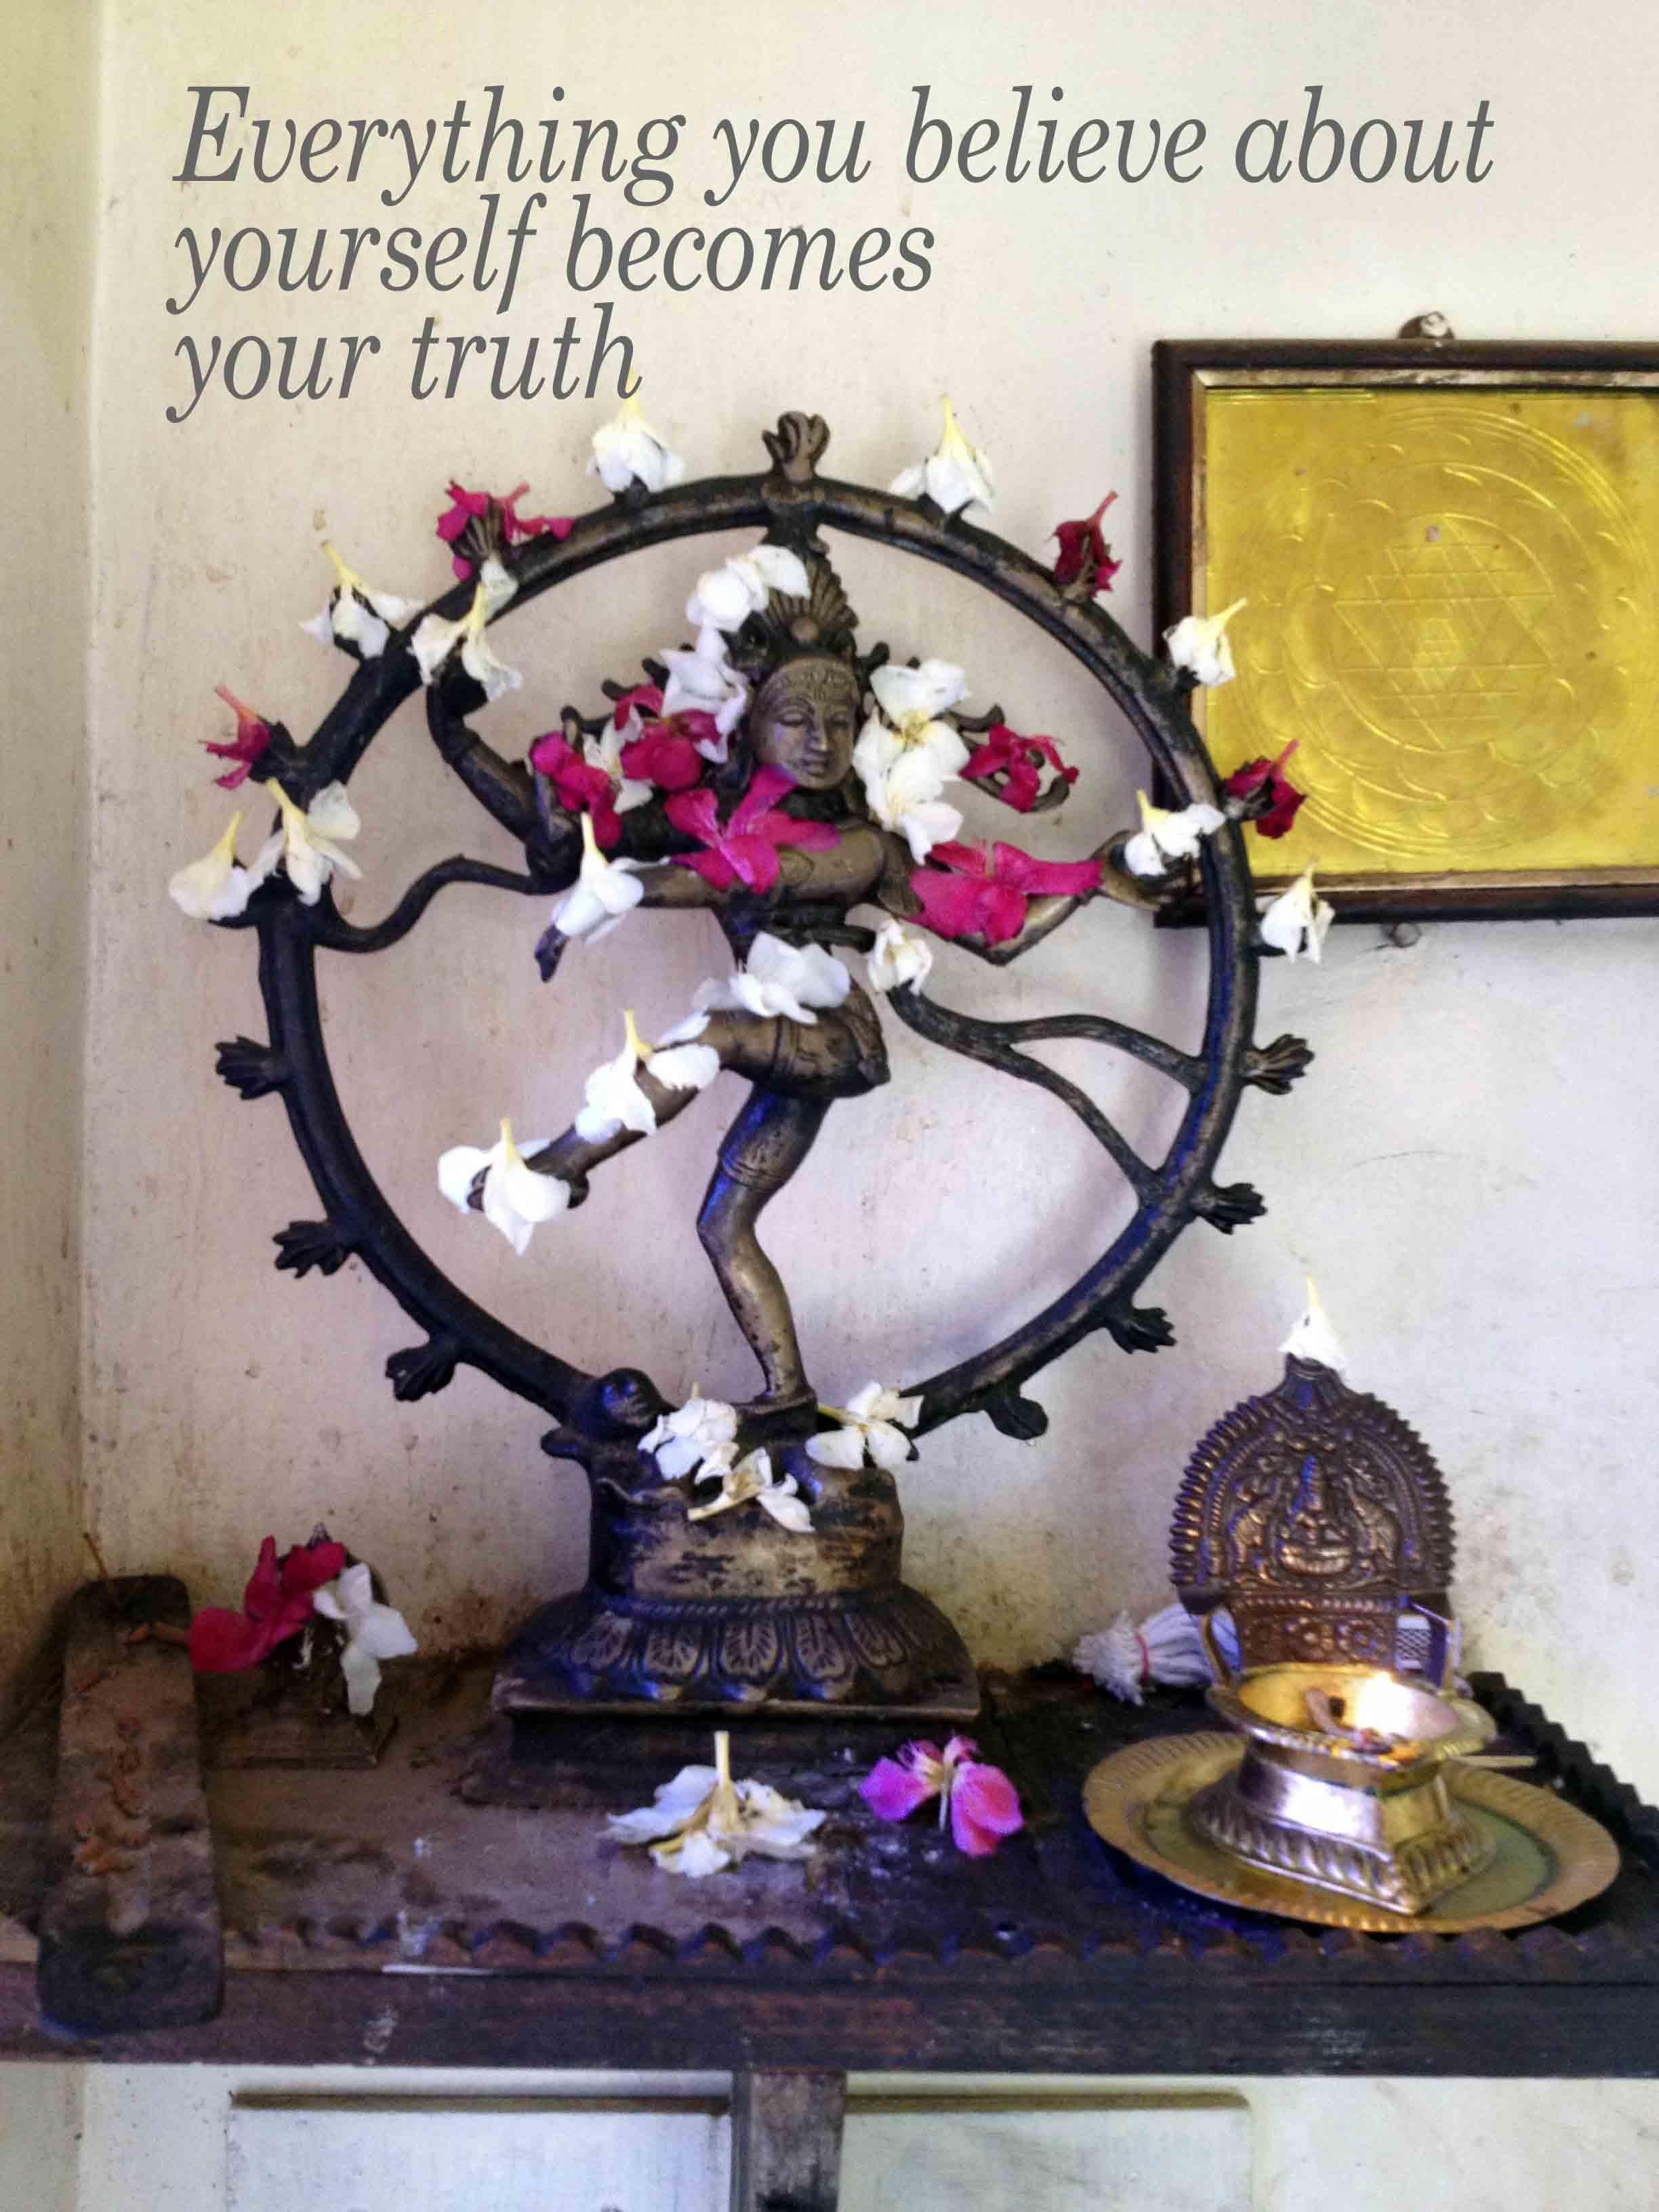 yoga, truth, believe, judy hirsh, united, mat